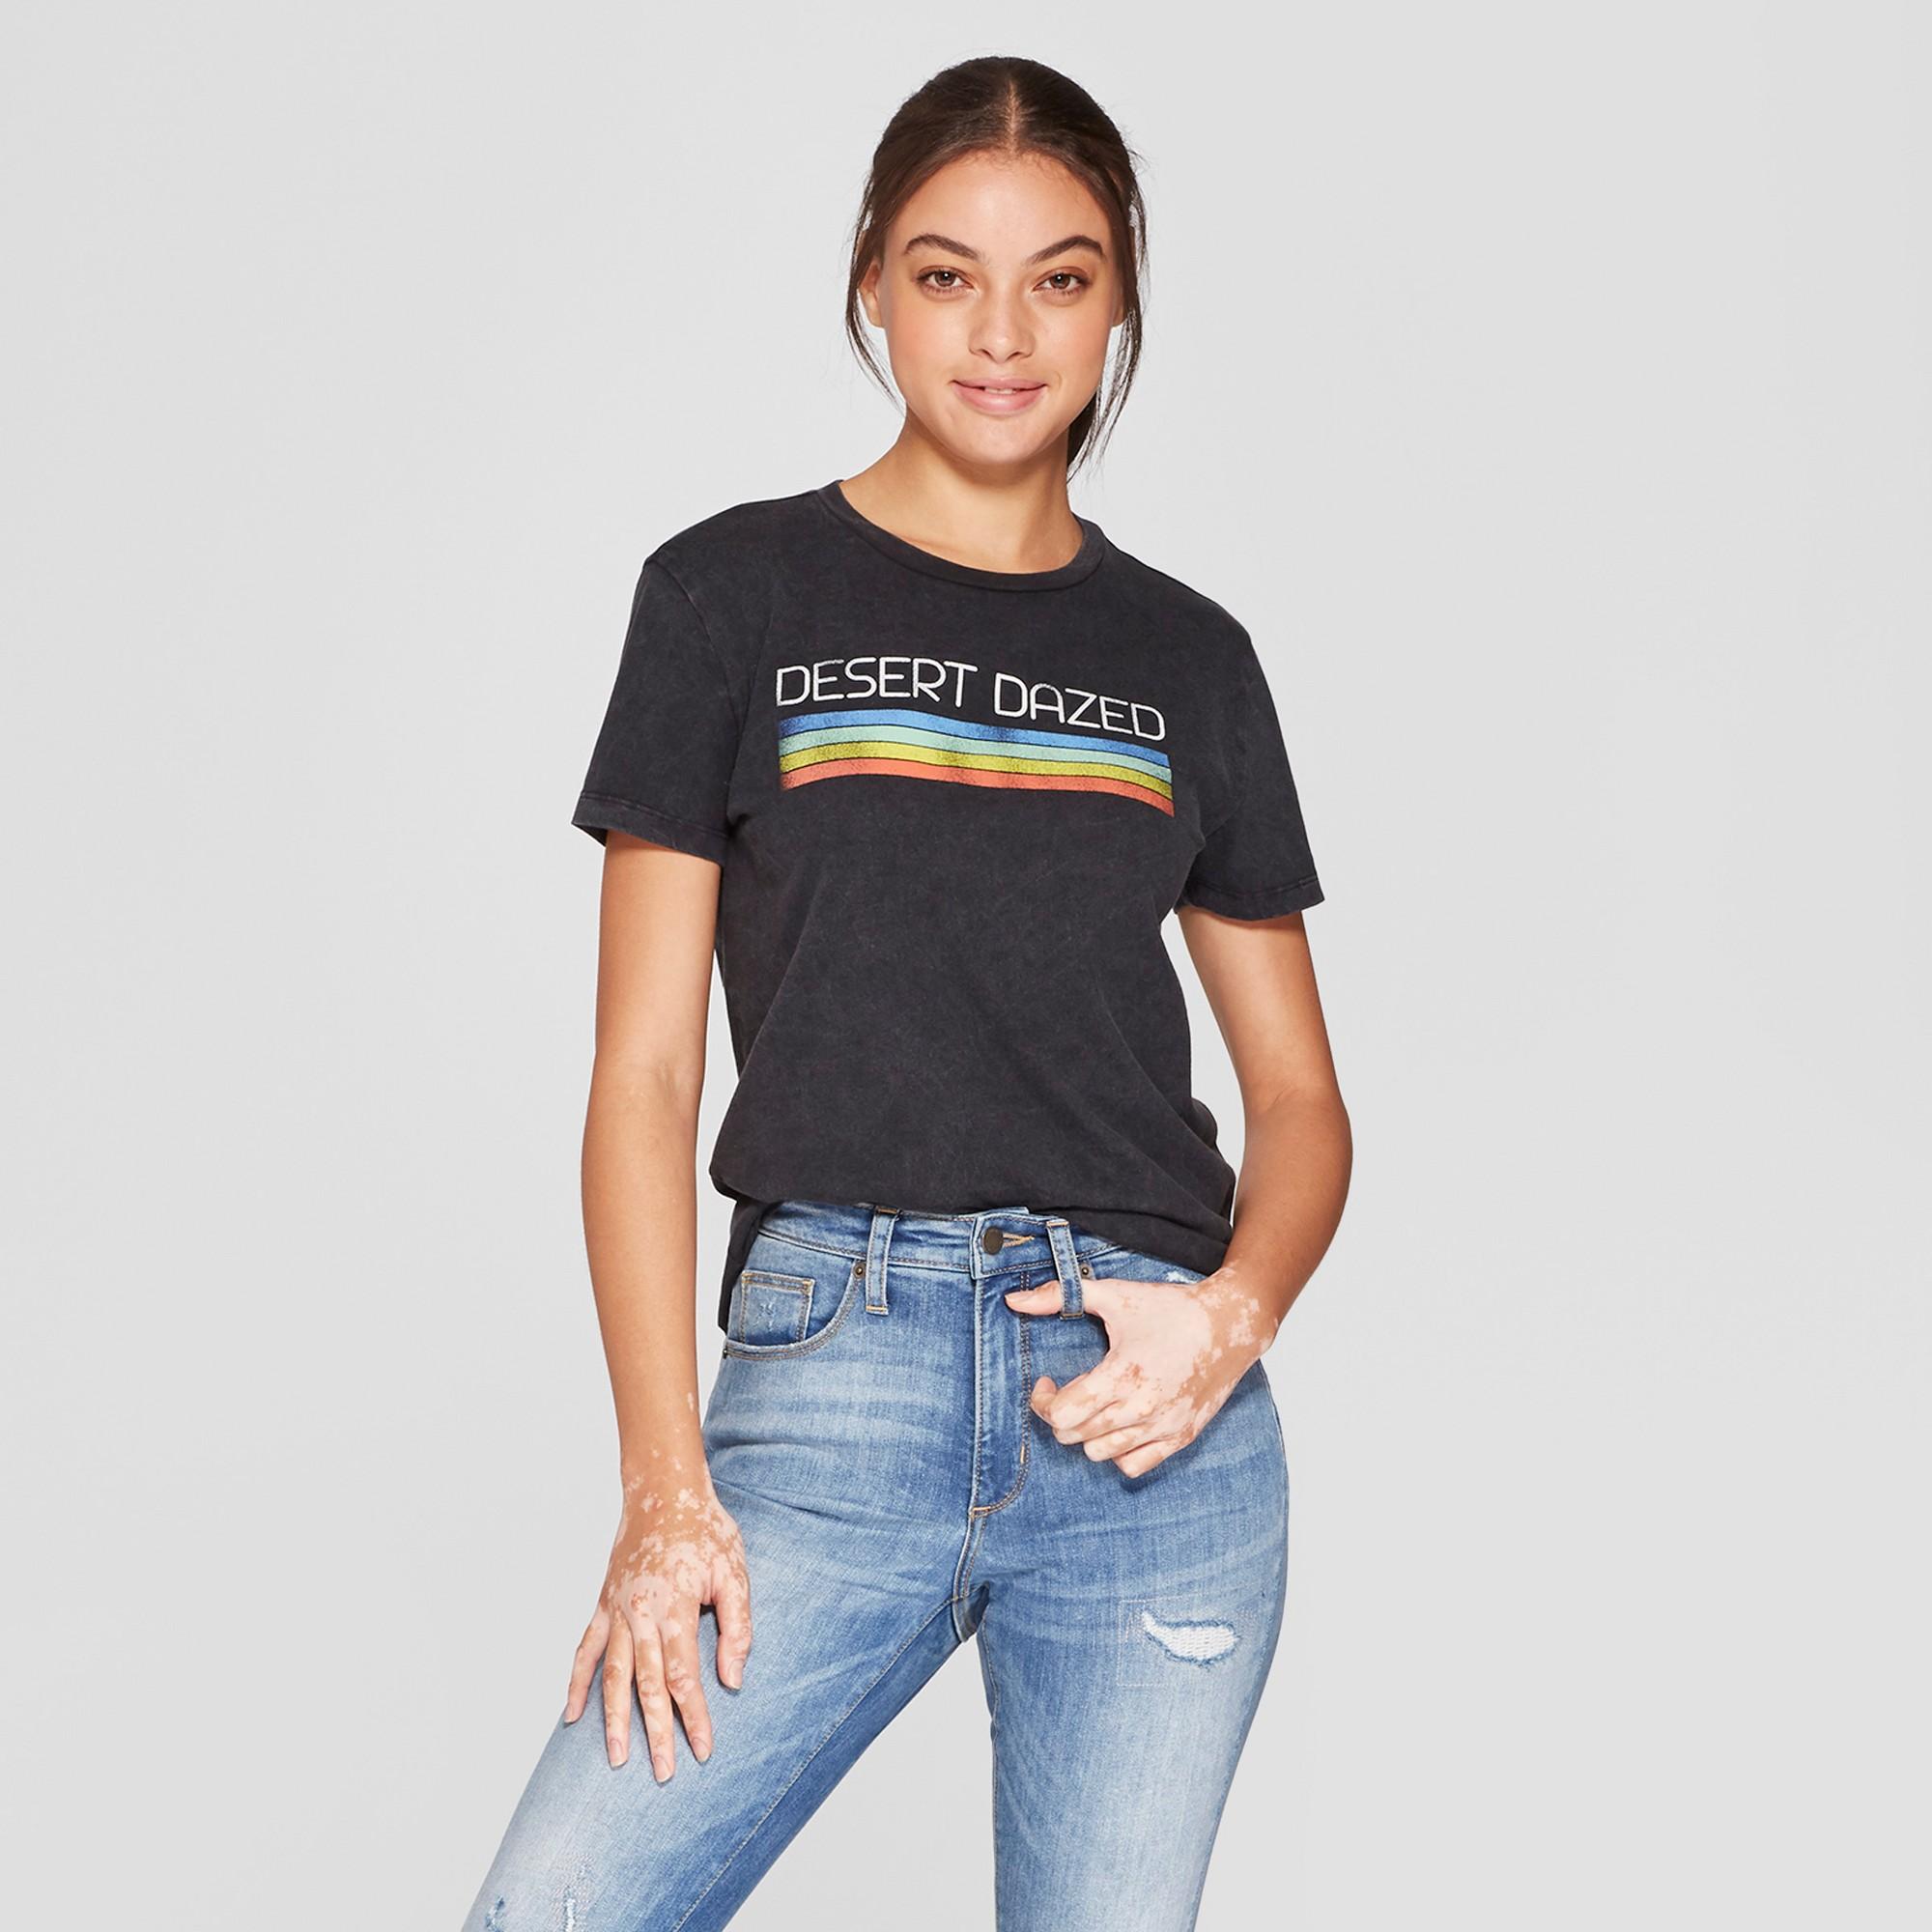 b14e5776d5fb08 Women's Short Sleeve Desert Dazed Graphic T-Shirt - Mighty Fine (Juniors')  Black Xxl